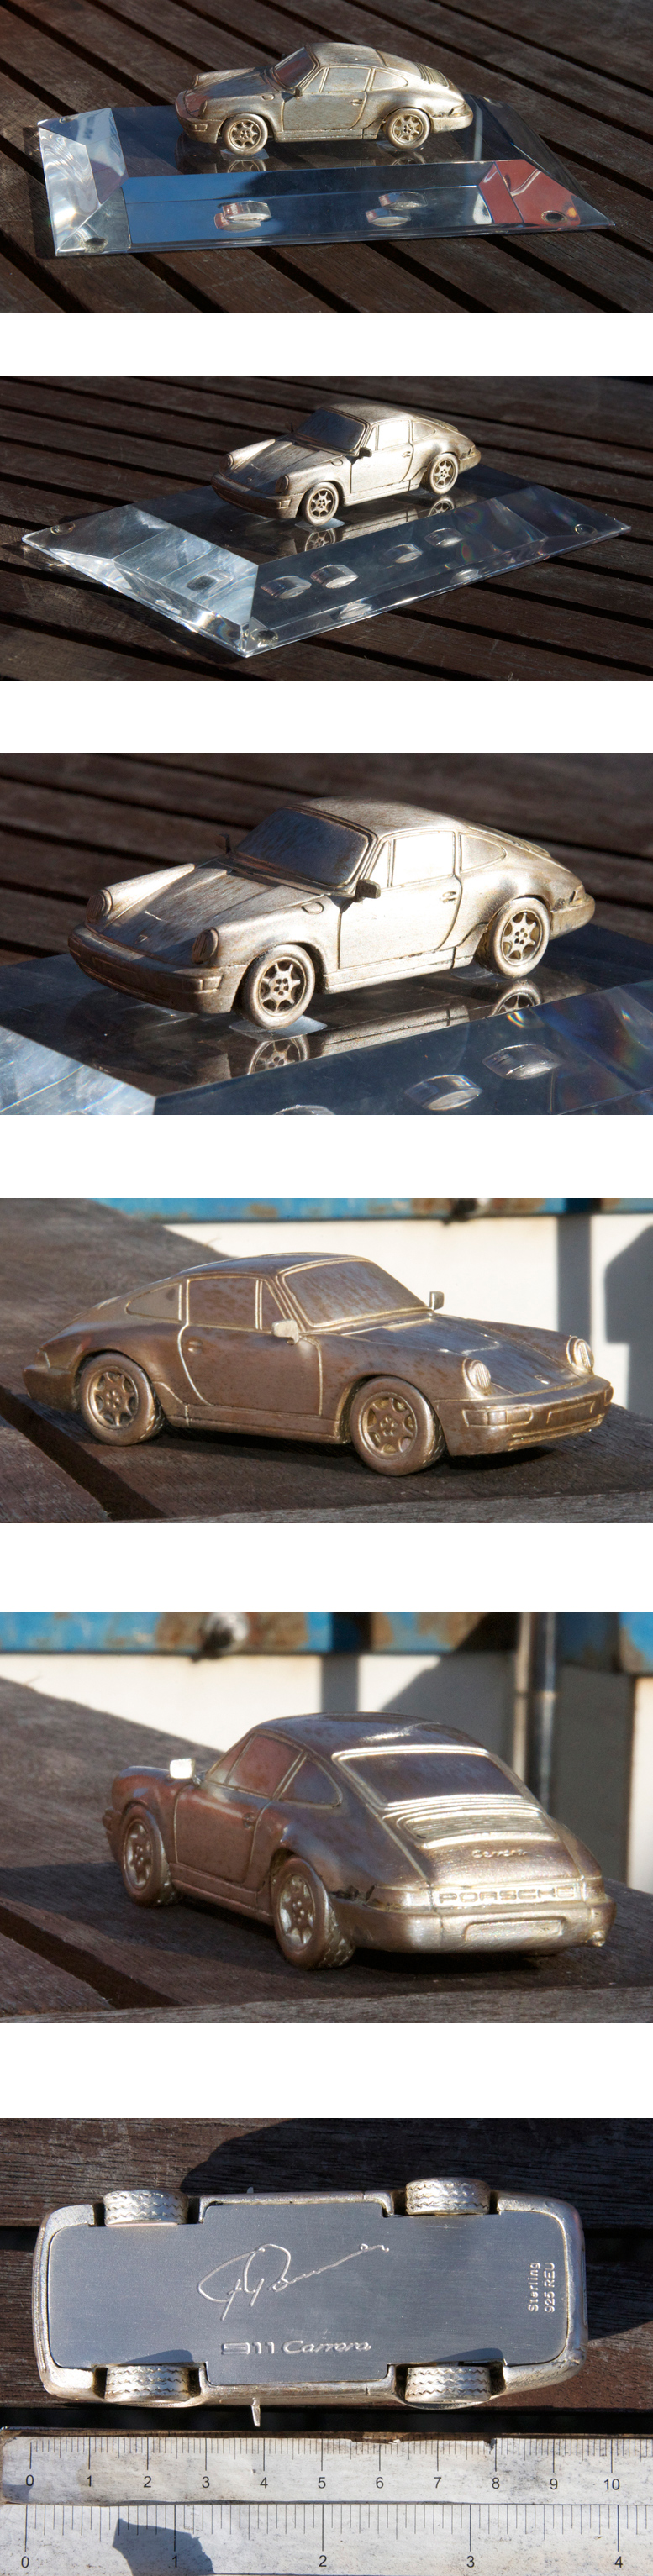 Vintage Automobile Porsche Trophy Porsche 911 Carrera